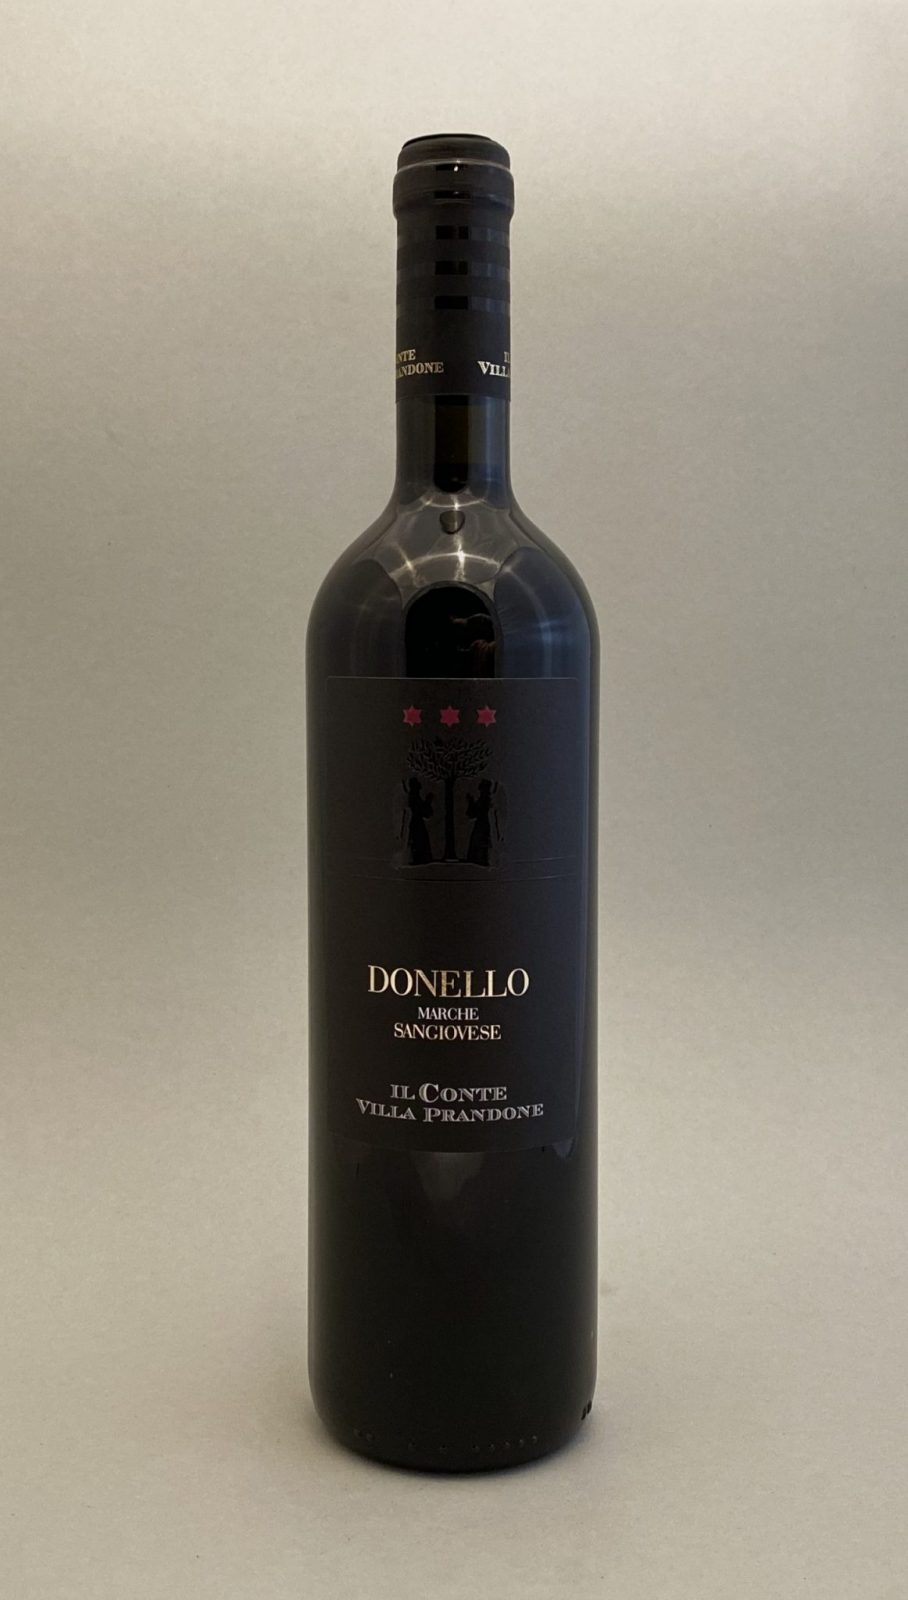 IL CONTE VILLA PRANDONE Sangiovese Donello, vinoteka Bratislava Sunny wines slnecnice mesto, petrzalka, vino červené z Talianska, rozvoz vín, eshop